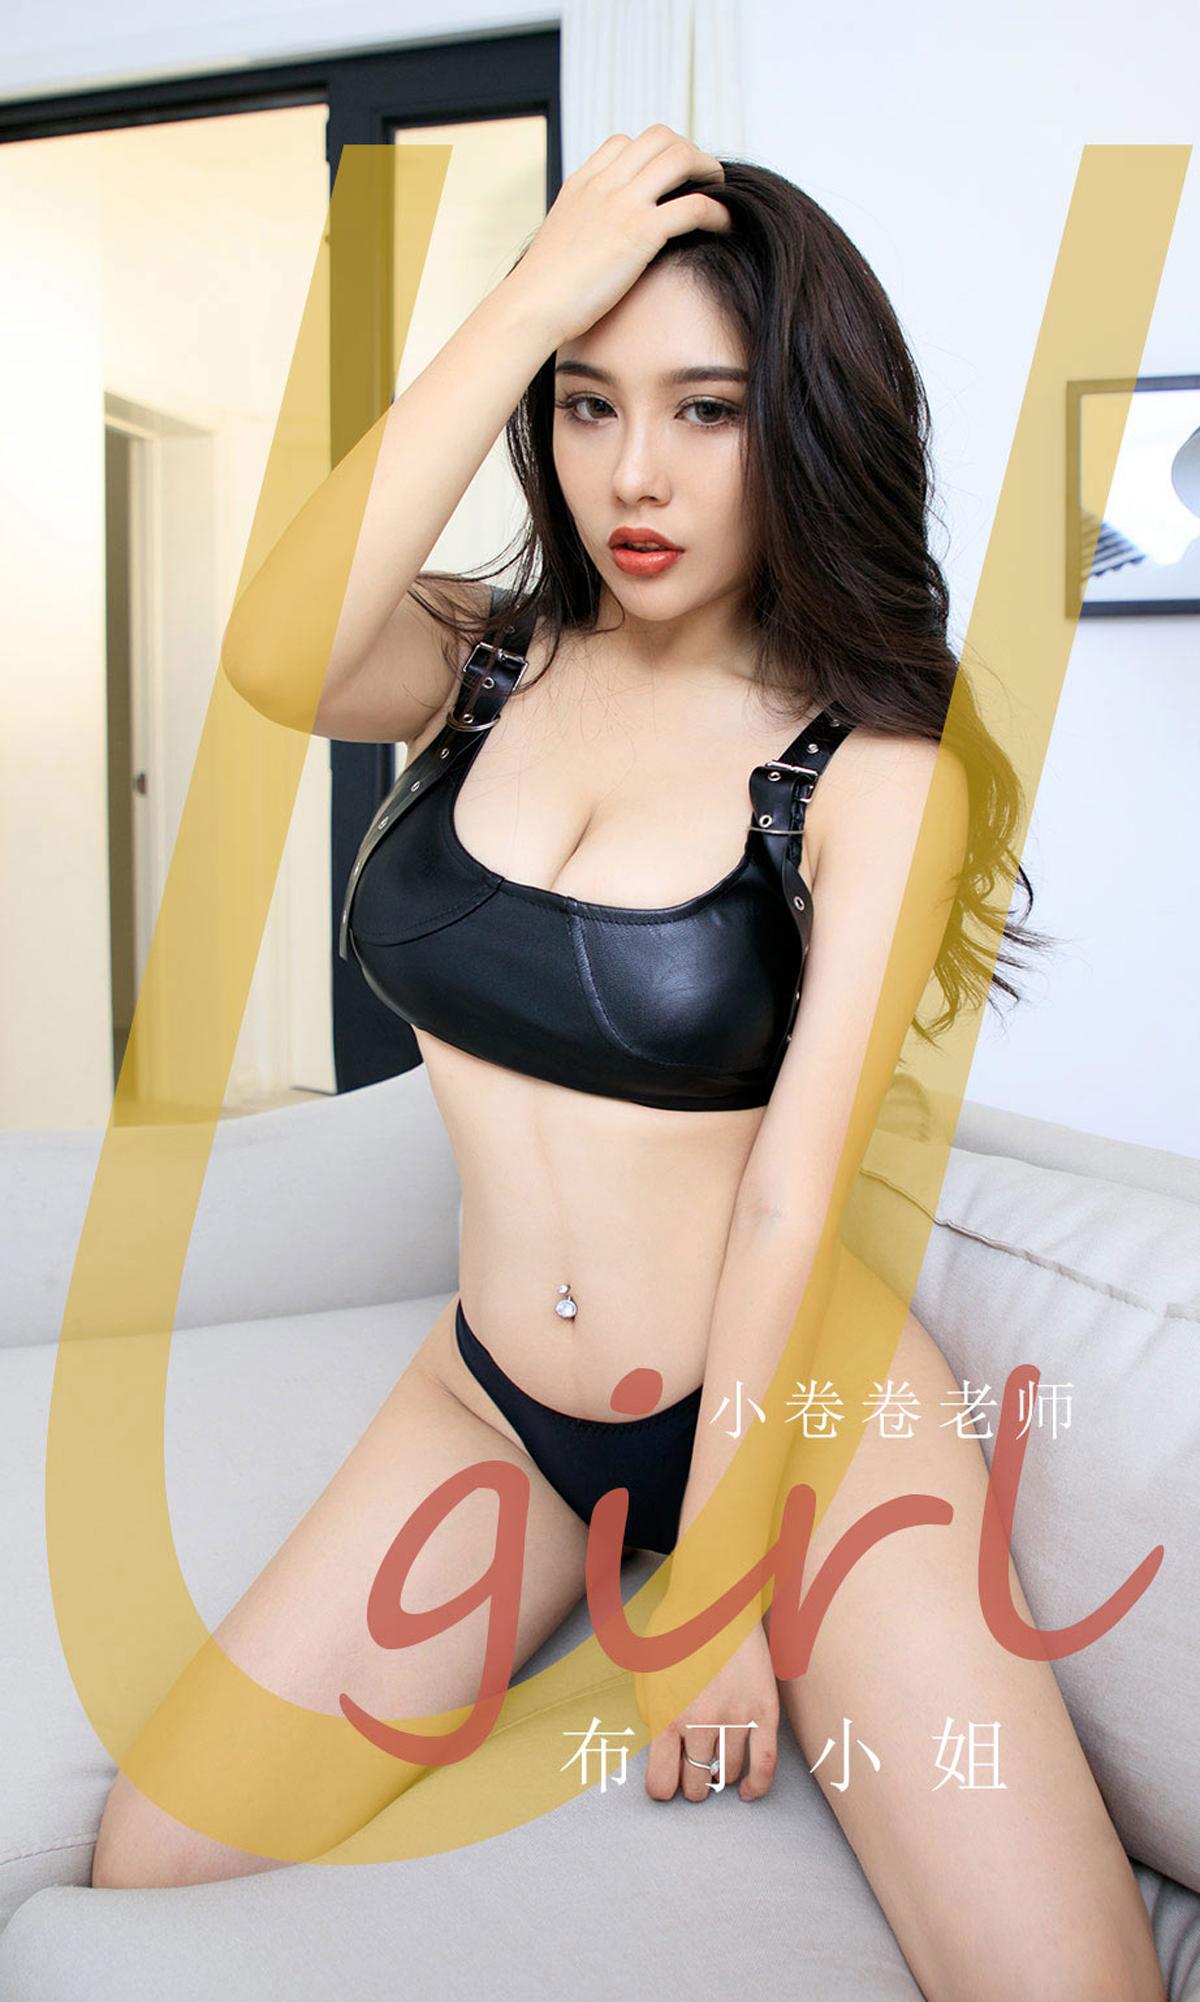 [Ugirls尤果网]爱尤物专辑 2020.03.22 No.1767 布丁小姐 小卷卷老师[/32MB]